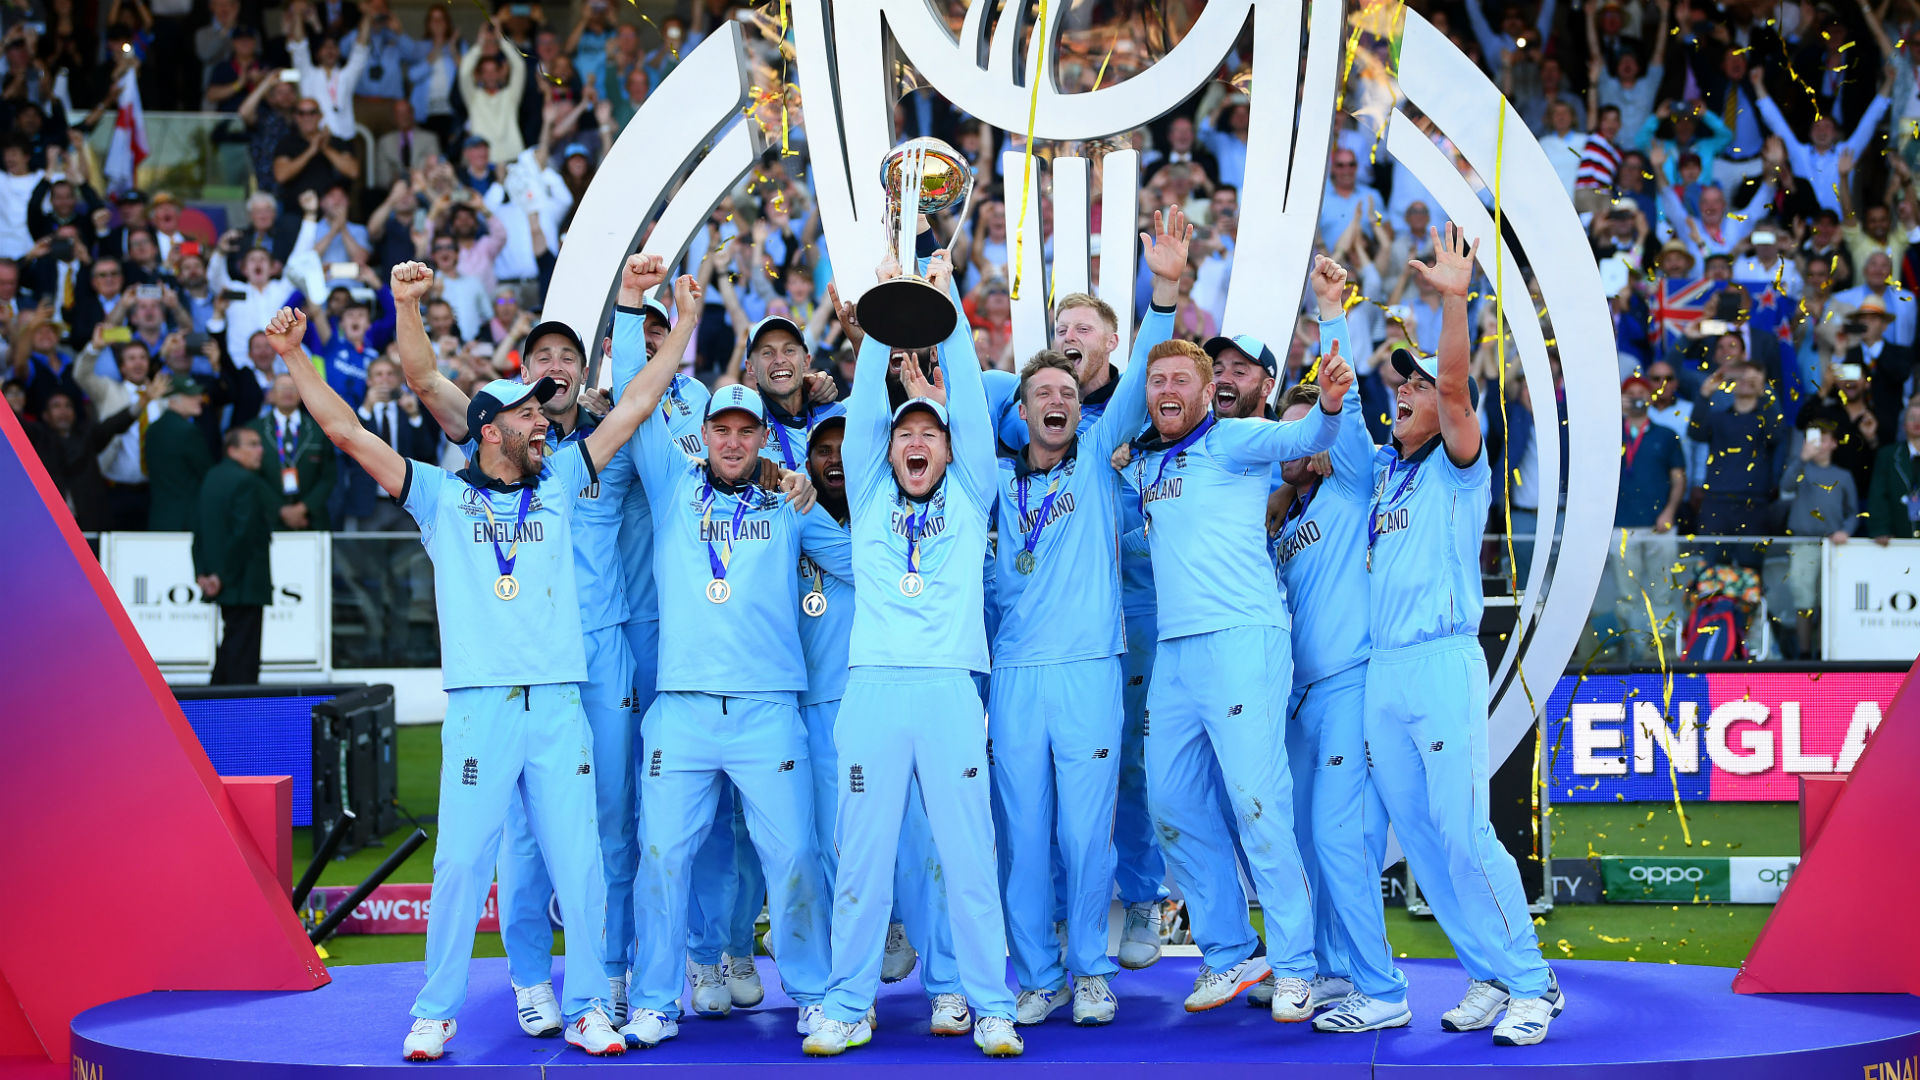 ICC announces World Cup Super League ahead of England-Ireland series